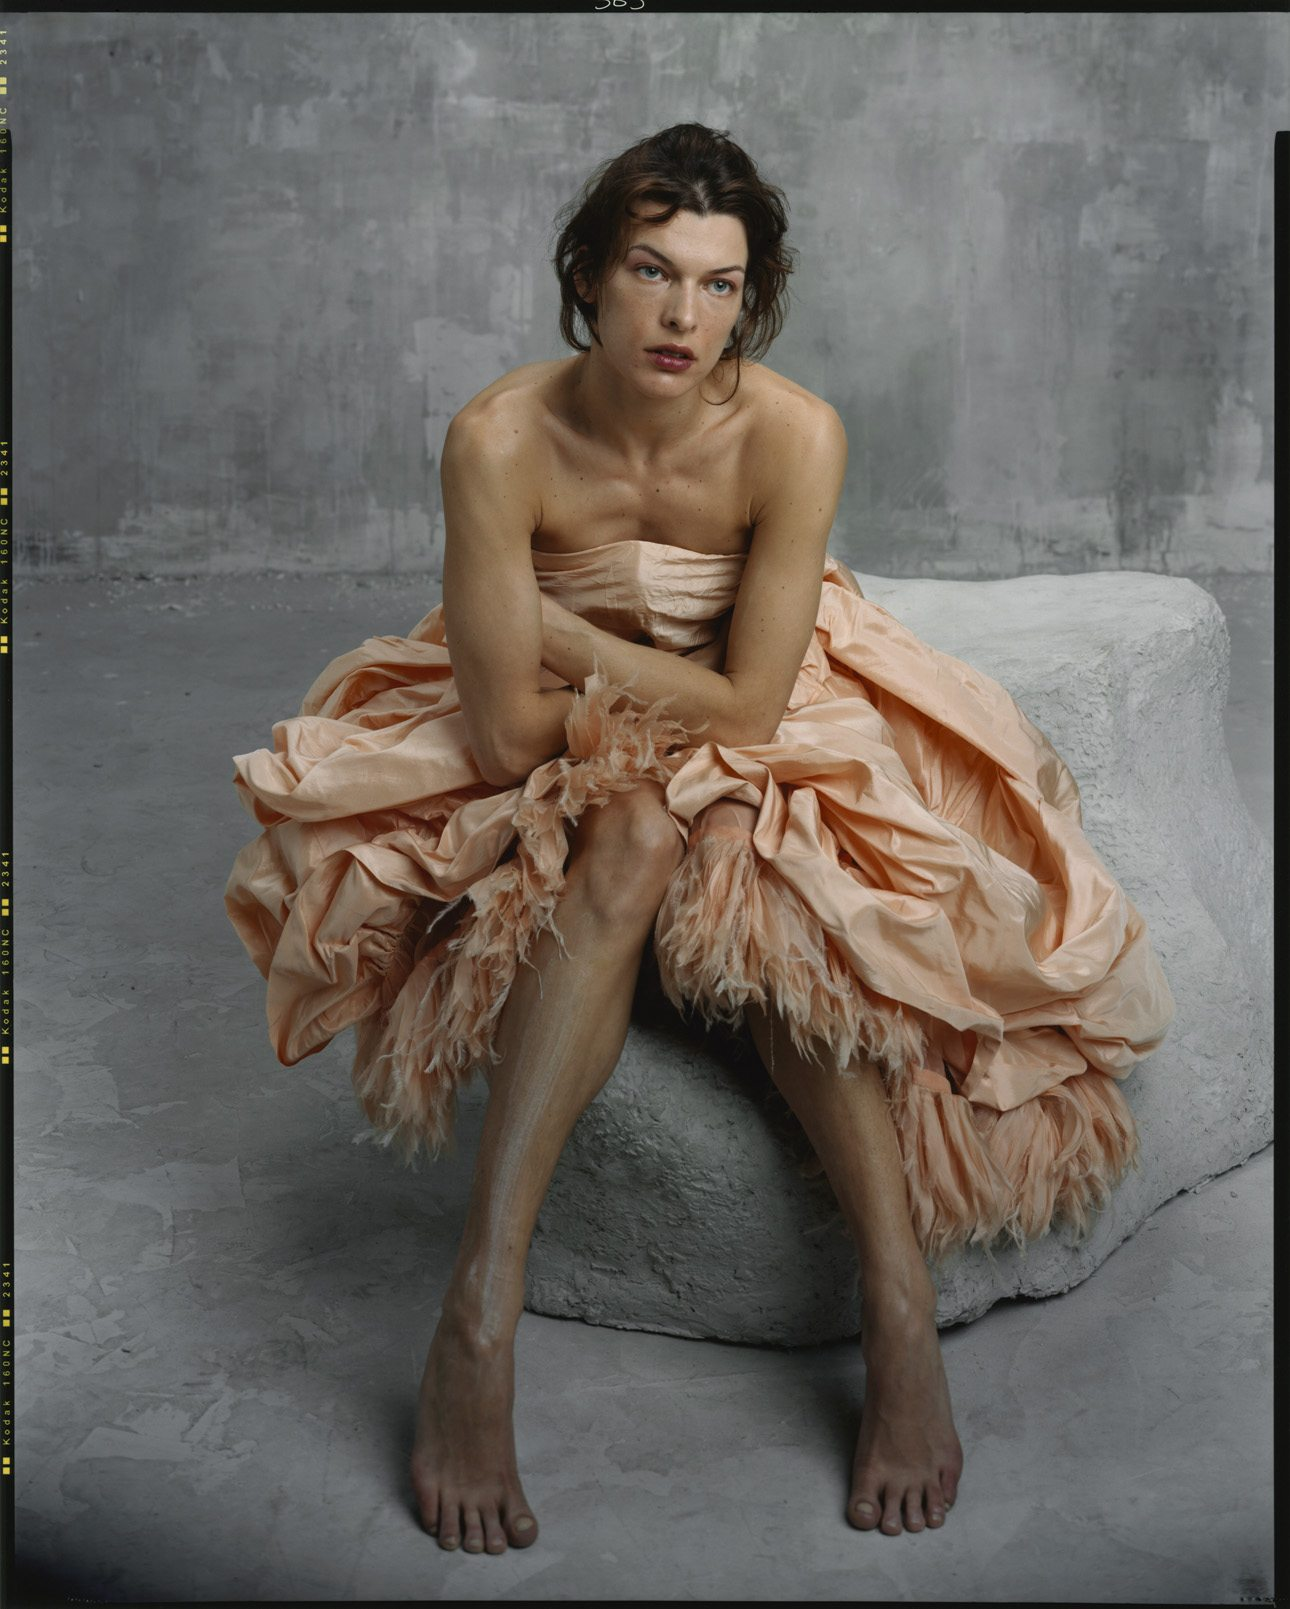 Milla Jovovich, étude, March 2005, Paris